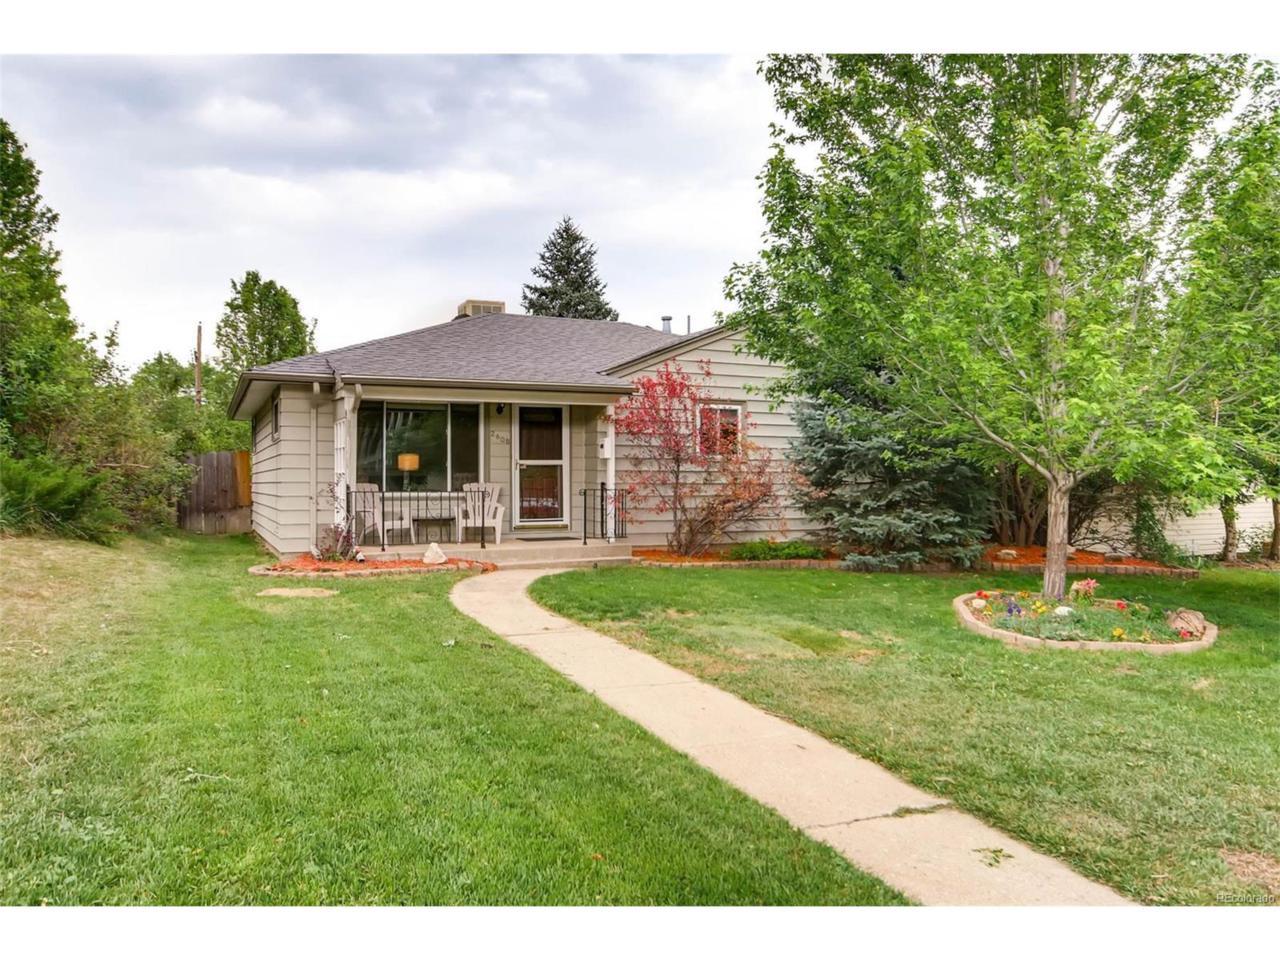 2608 Gray Street, Wheat Ridge, CO 80214 (MLS #5606893) :: 8z Real Estate